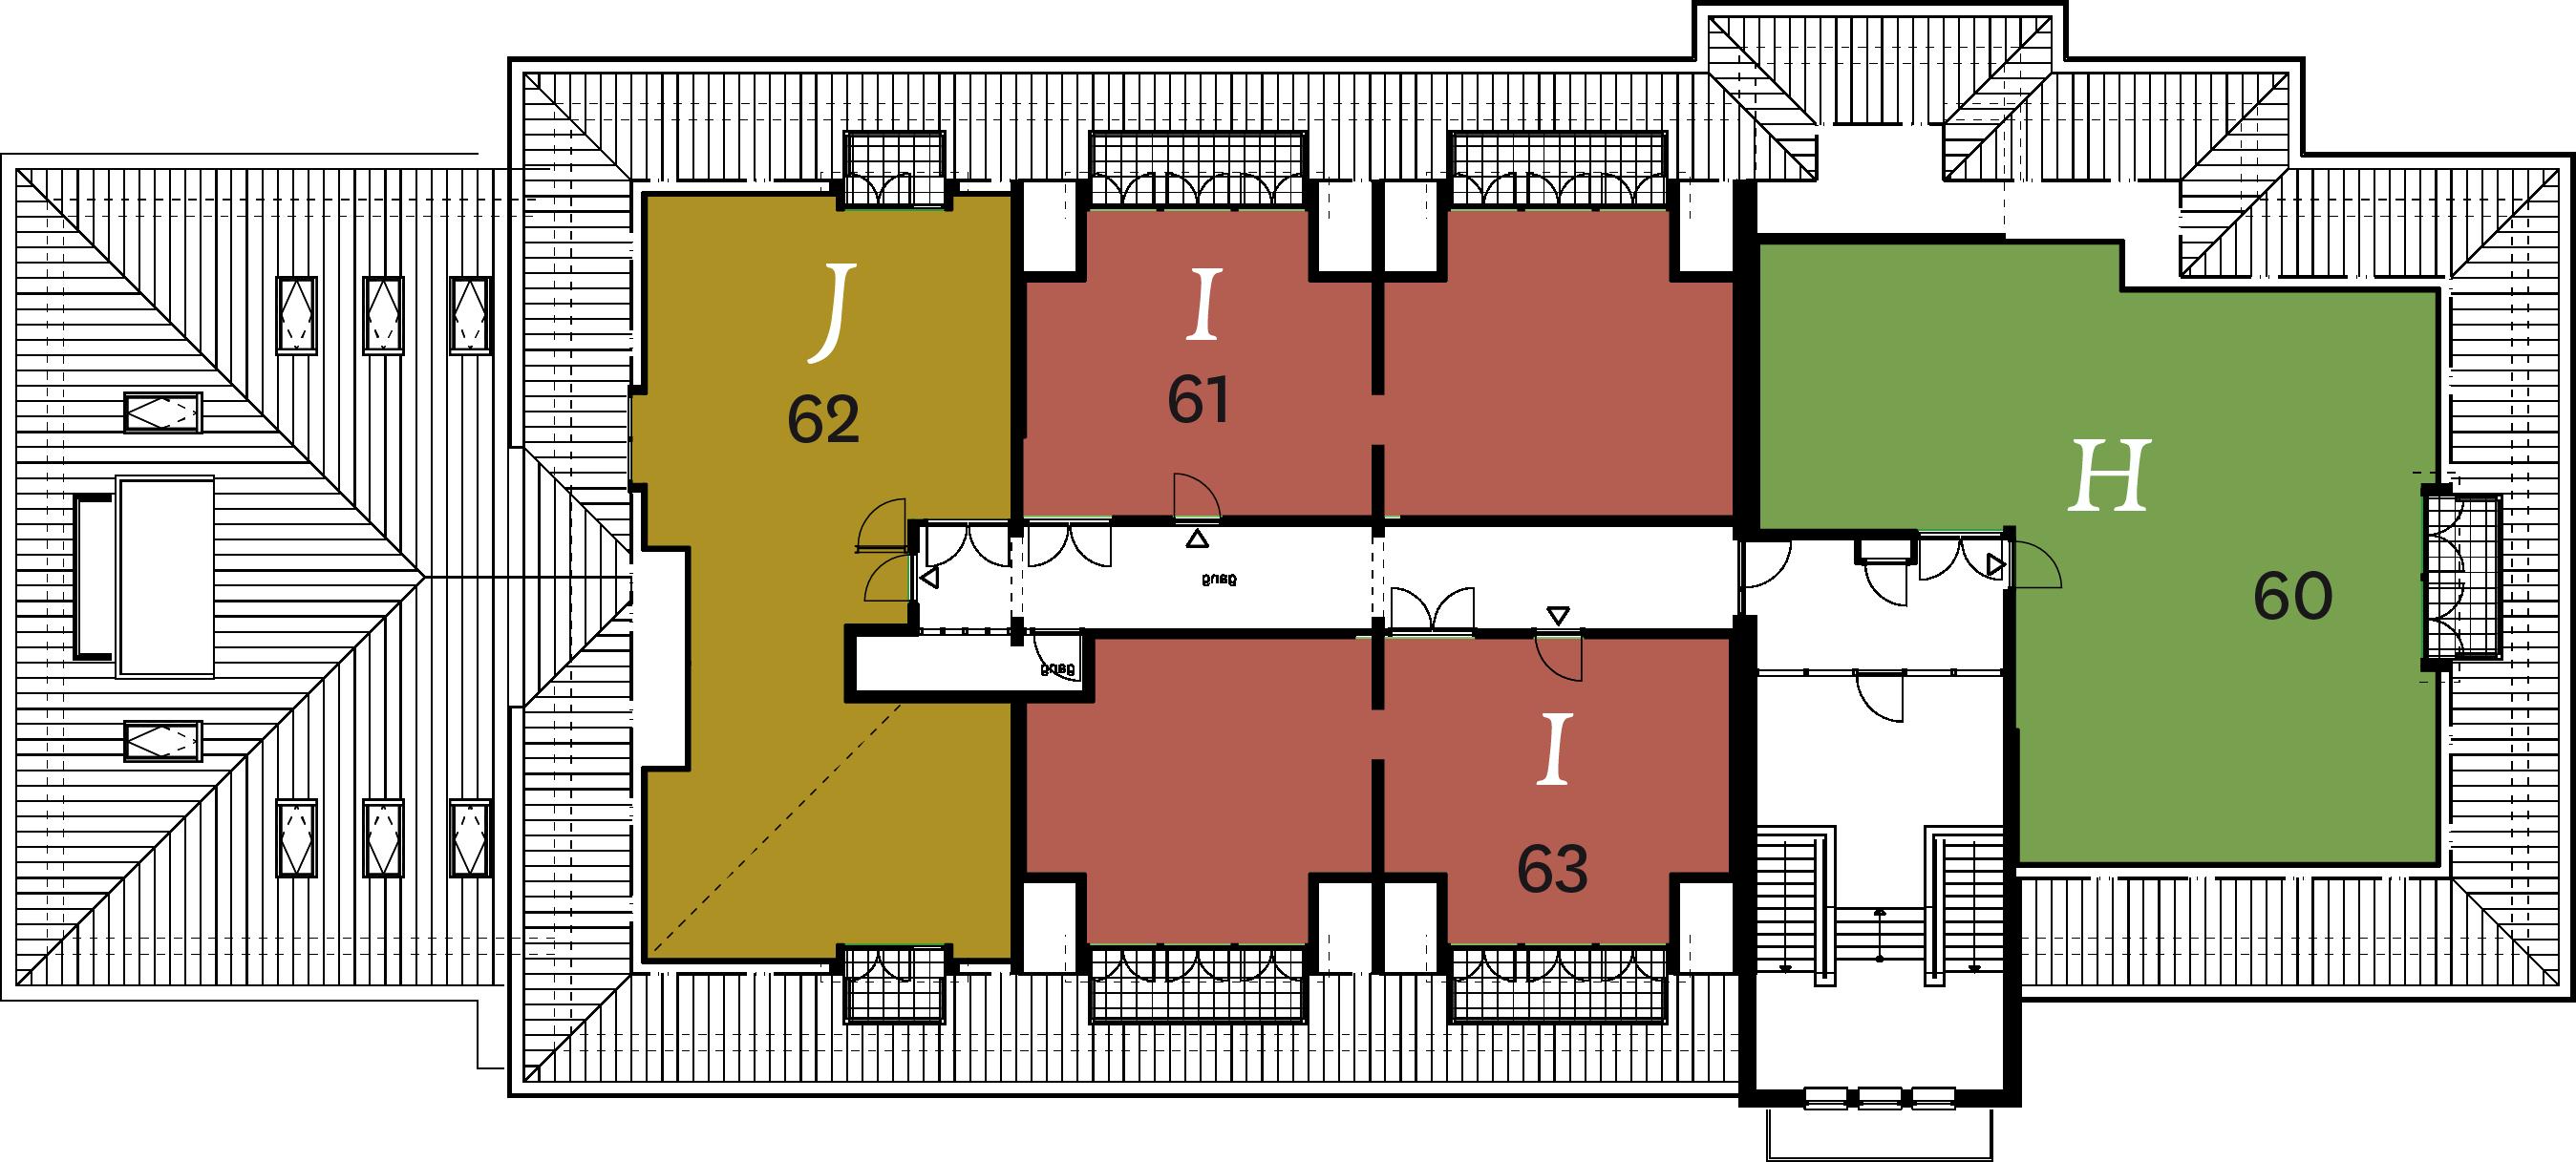 2e verdieping fase 3 plattegrond